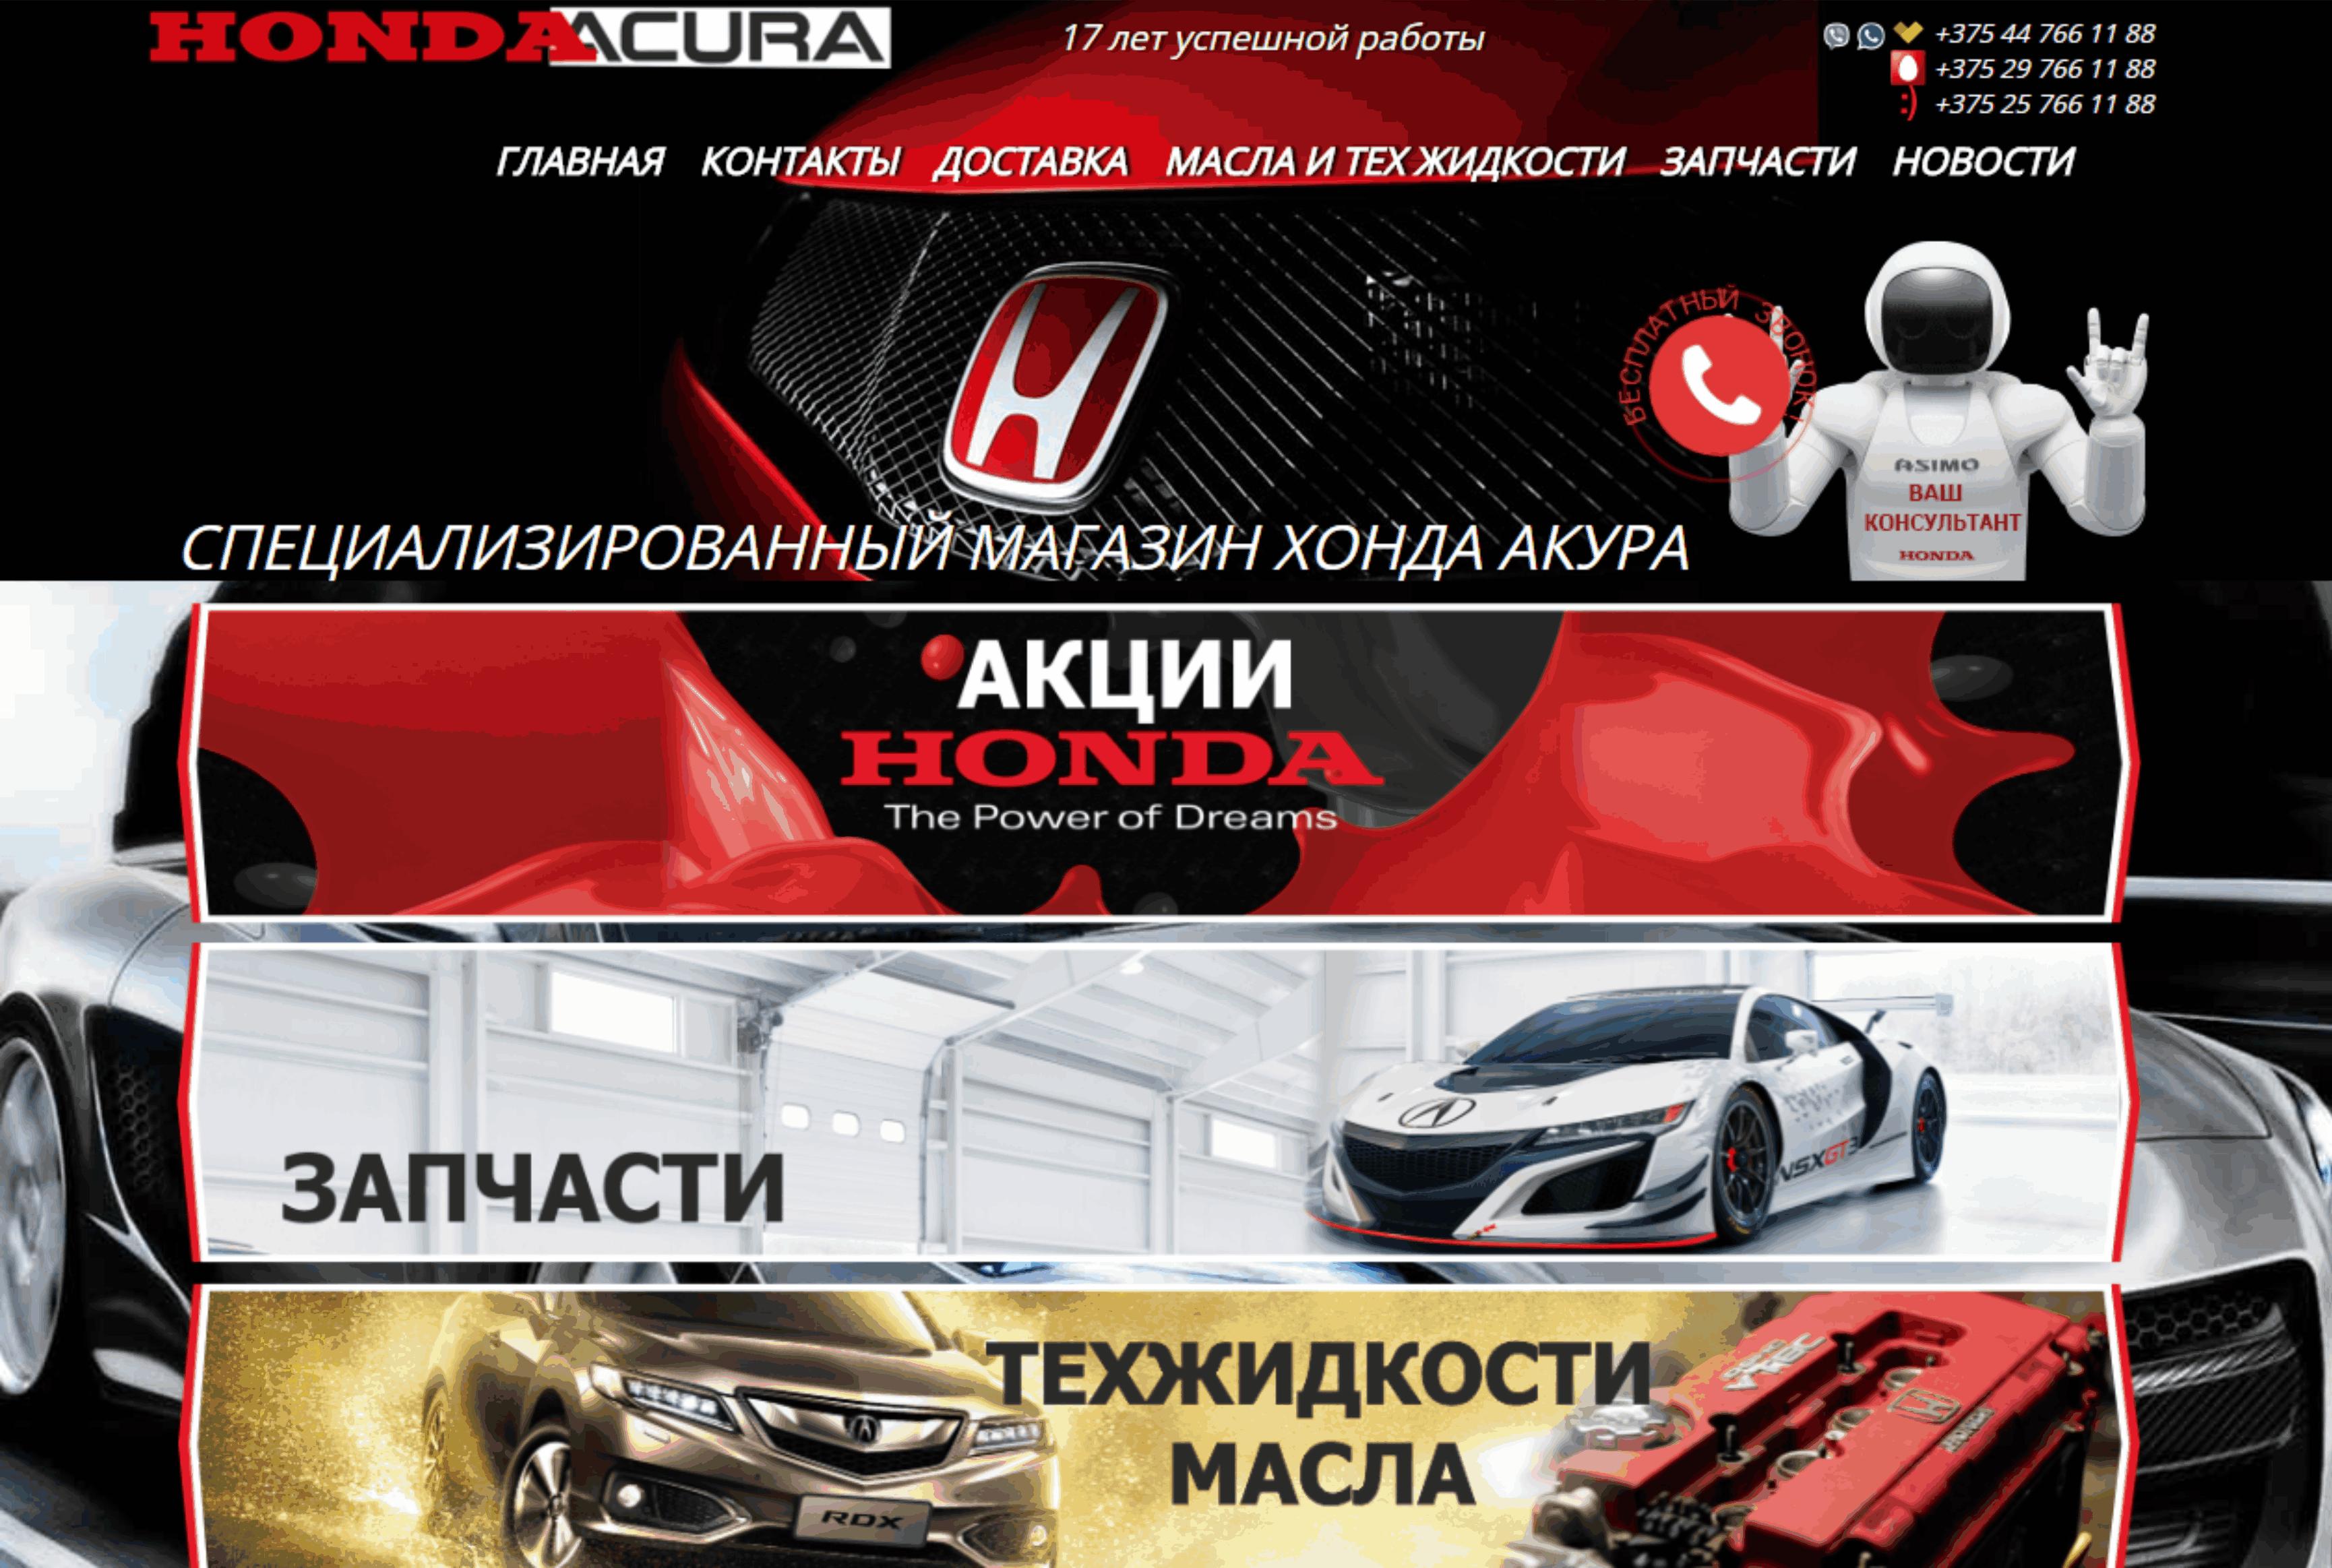 Разработка сайта honda-acura.by  reklama-on.by